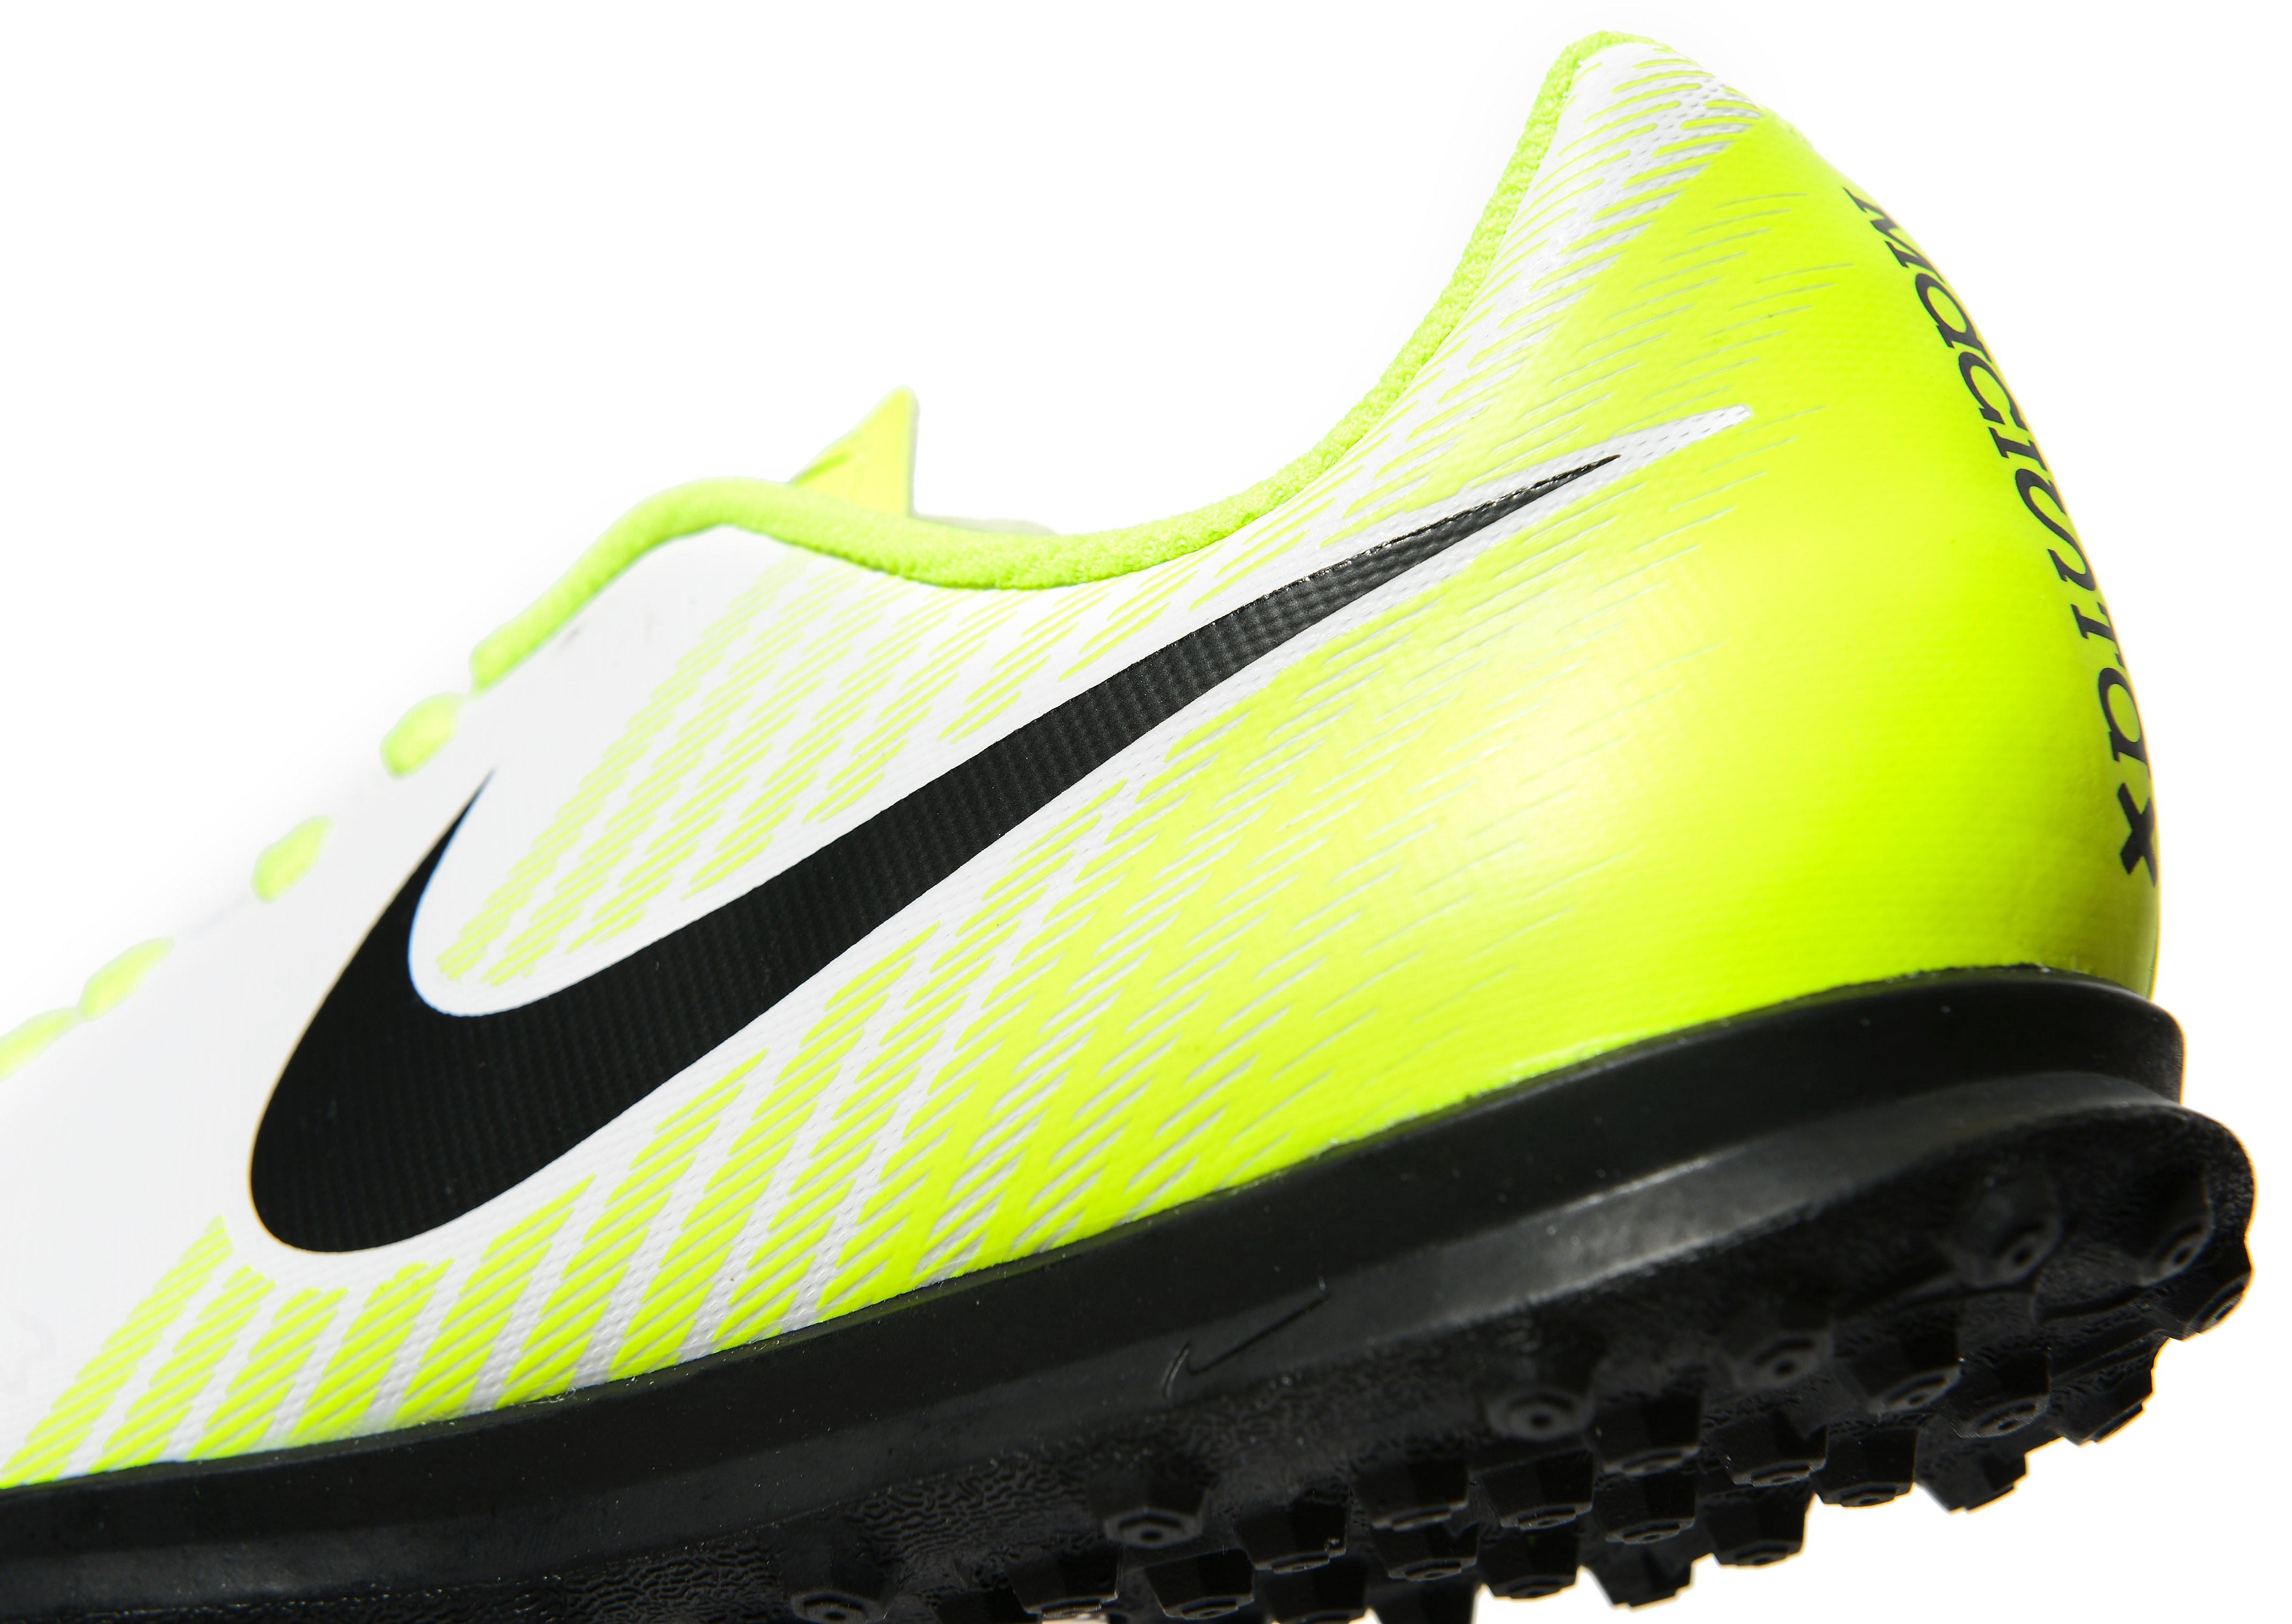 Nike Motion Blur Magista Ola Turf Children